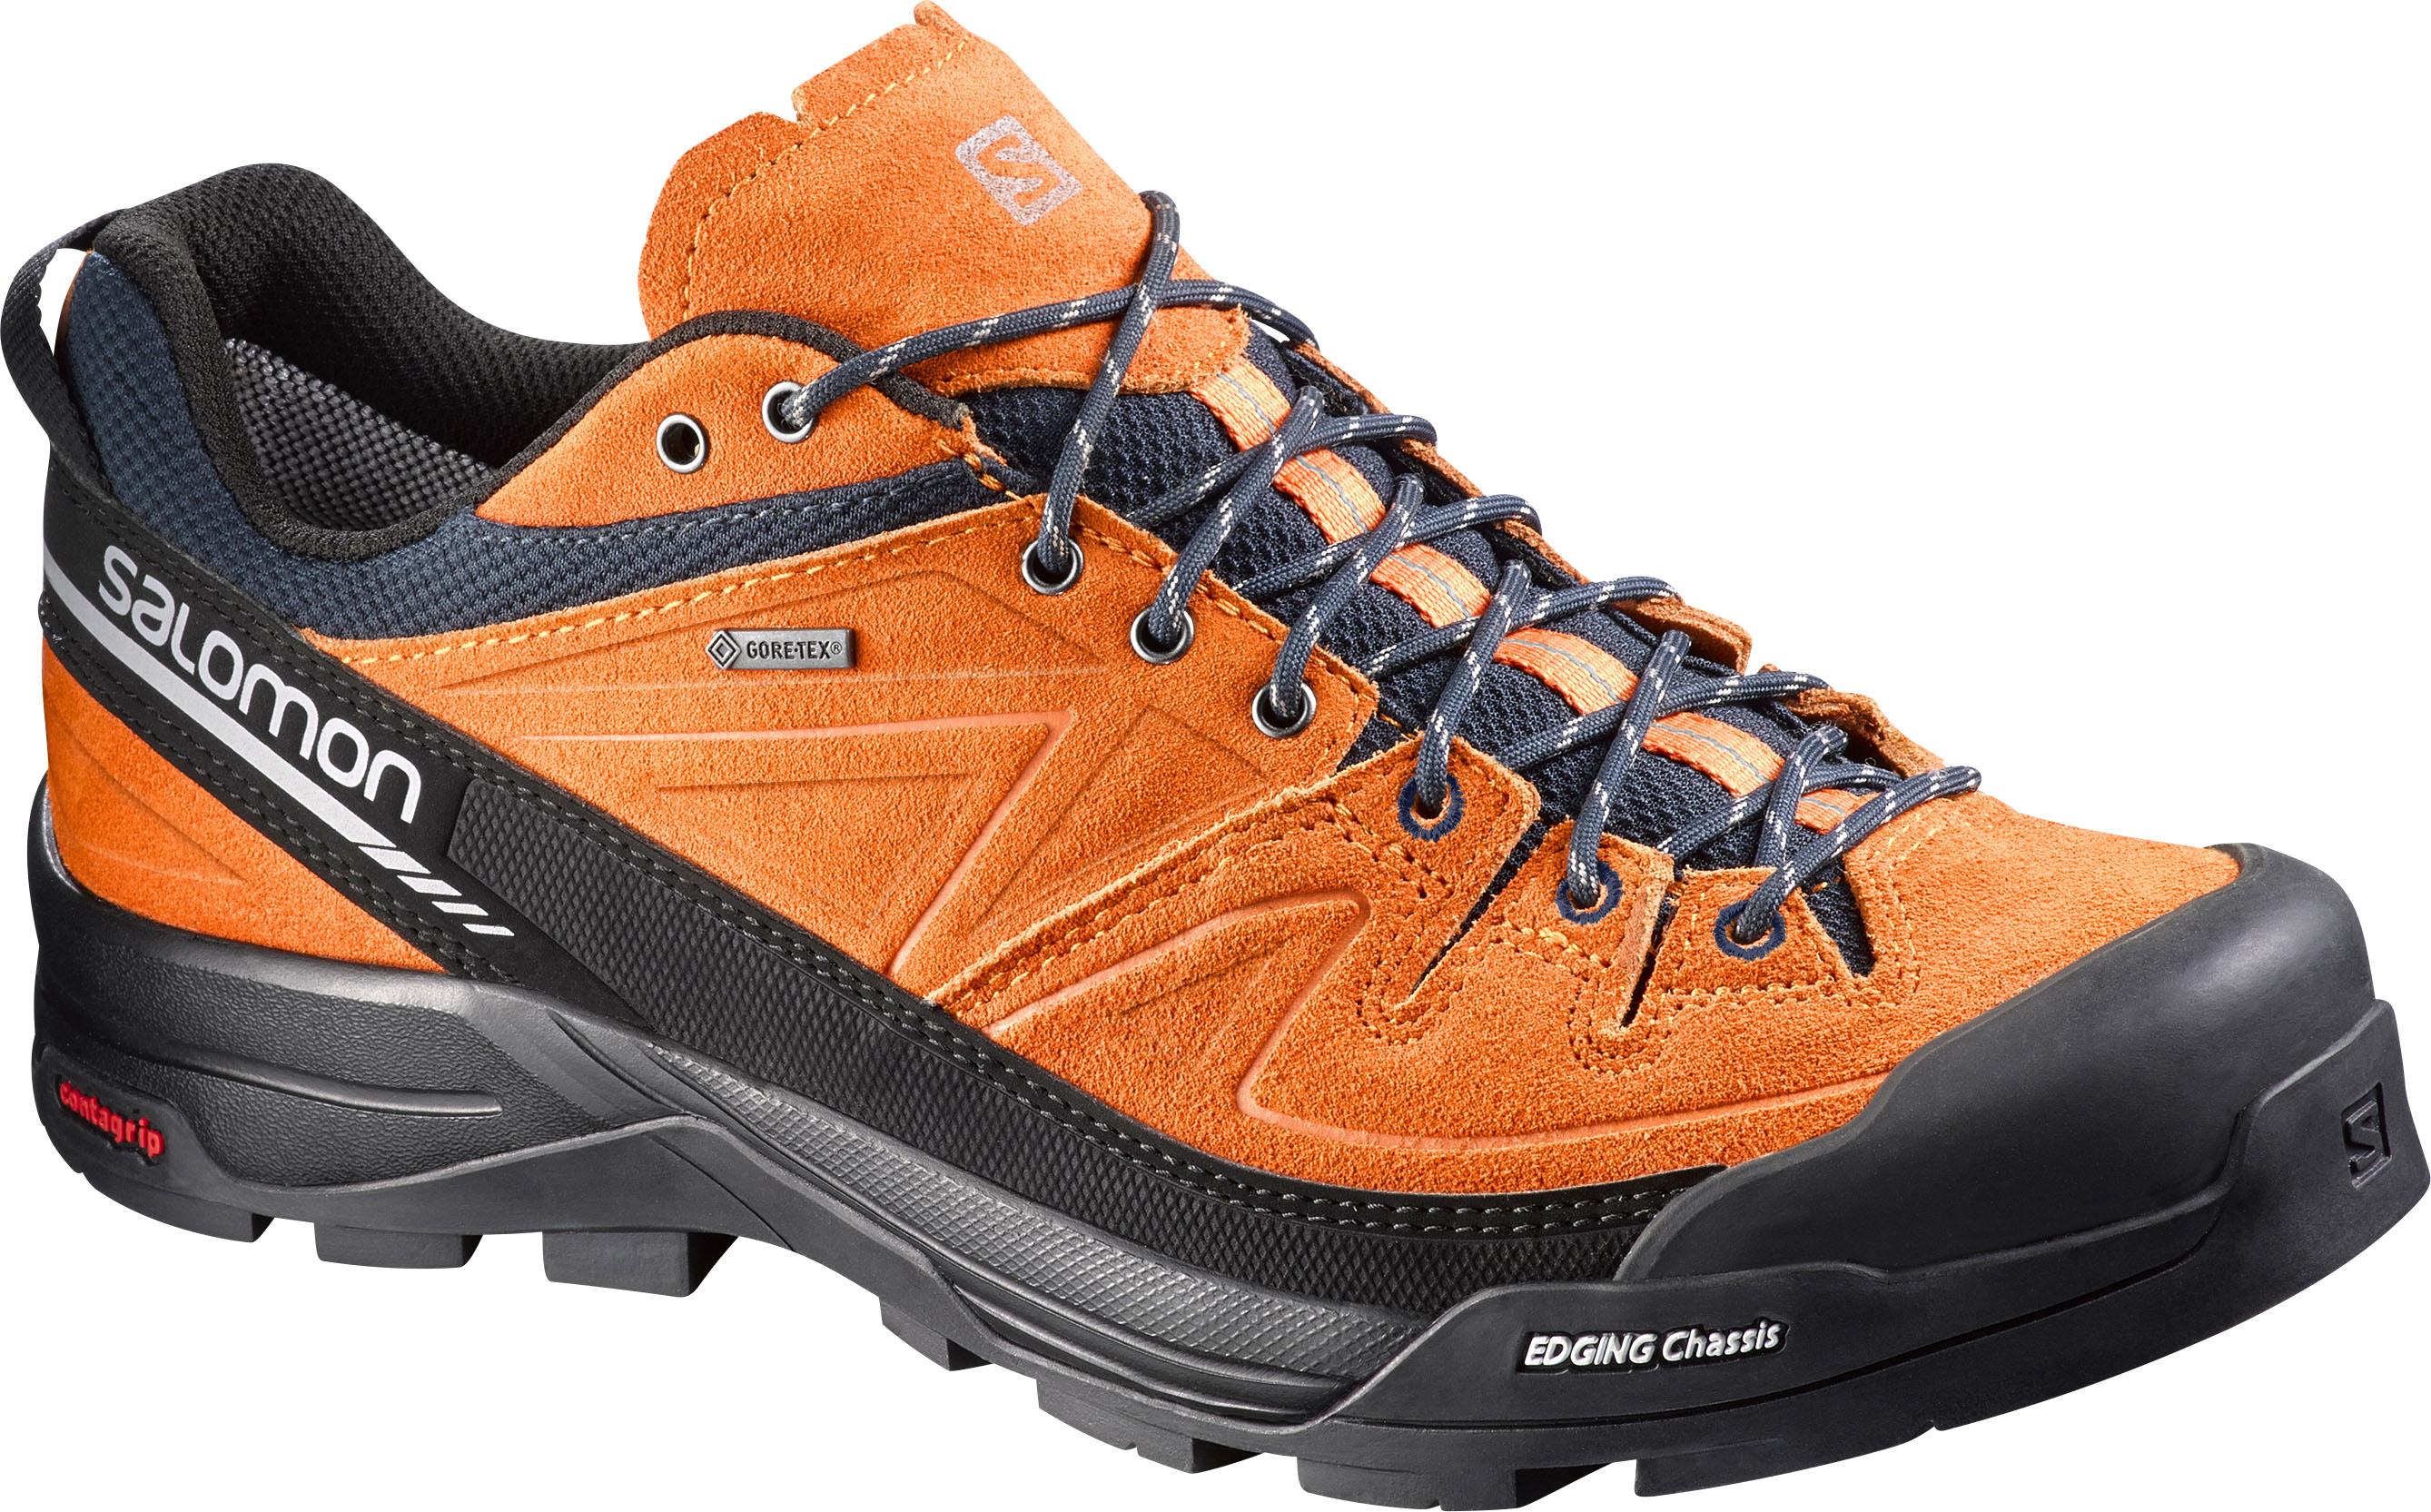 Salomon X Alp LTR GTX 379268 oranžová 41,3